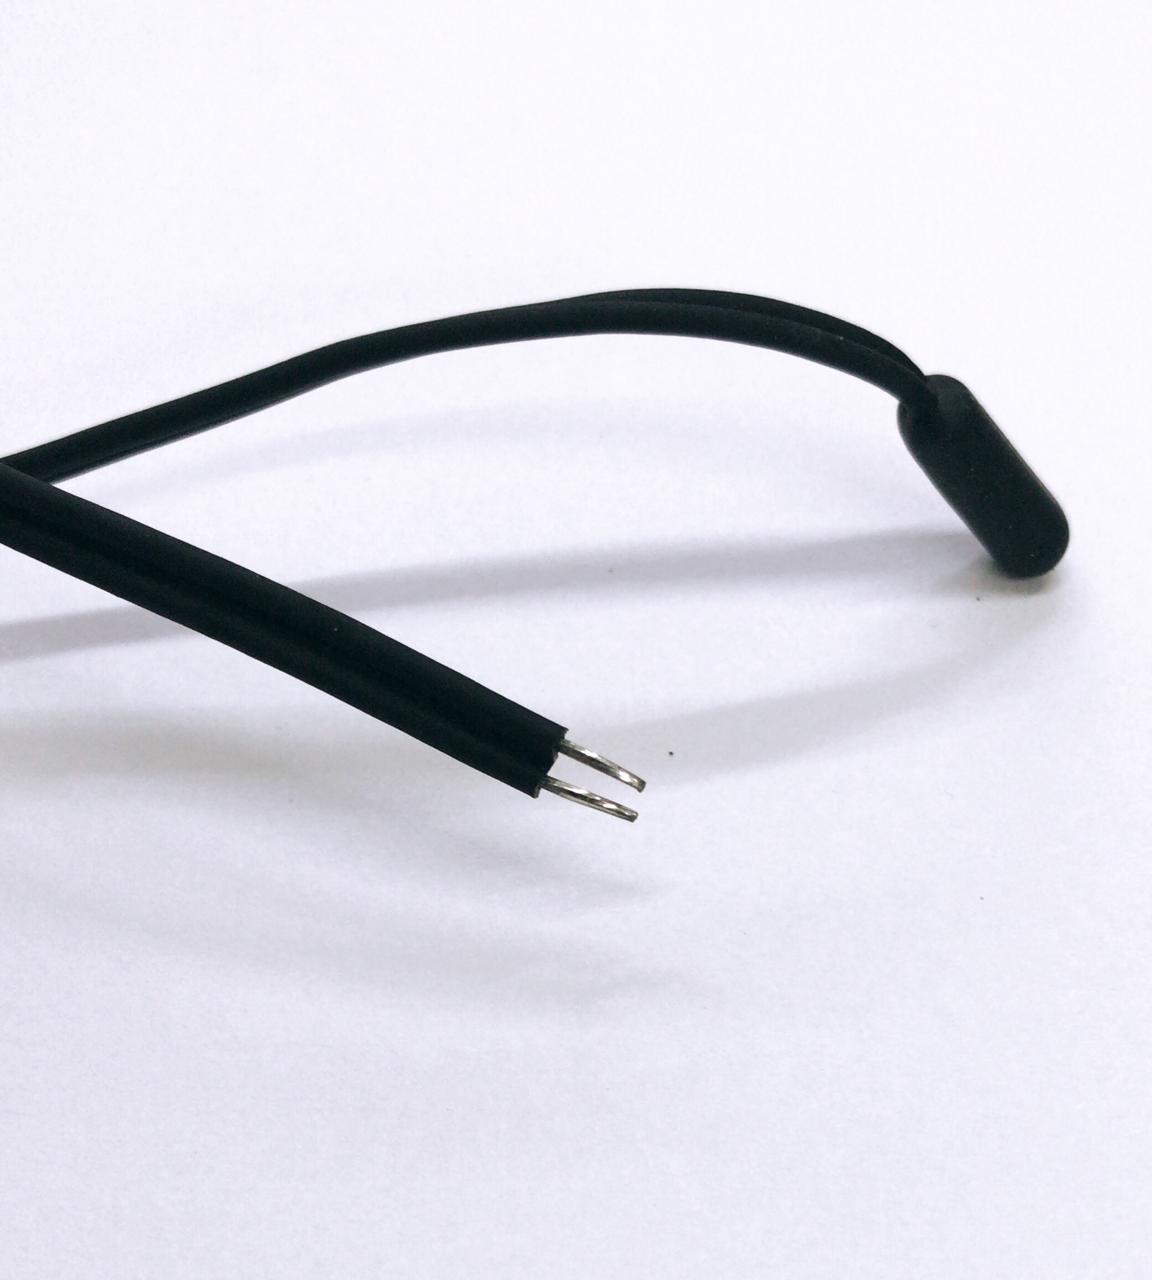 Kit Com 2 Sensor Ntc Bebedouro Purificador Moderno Latina